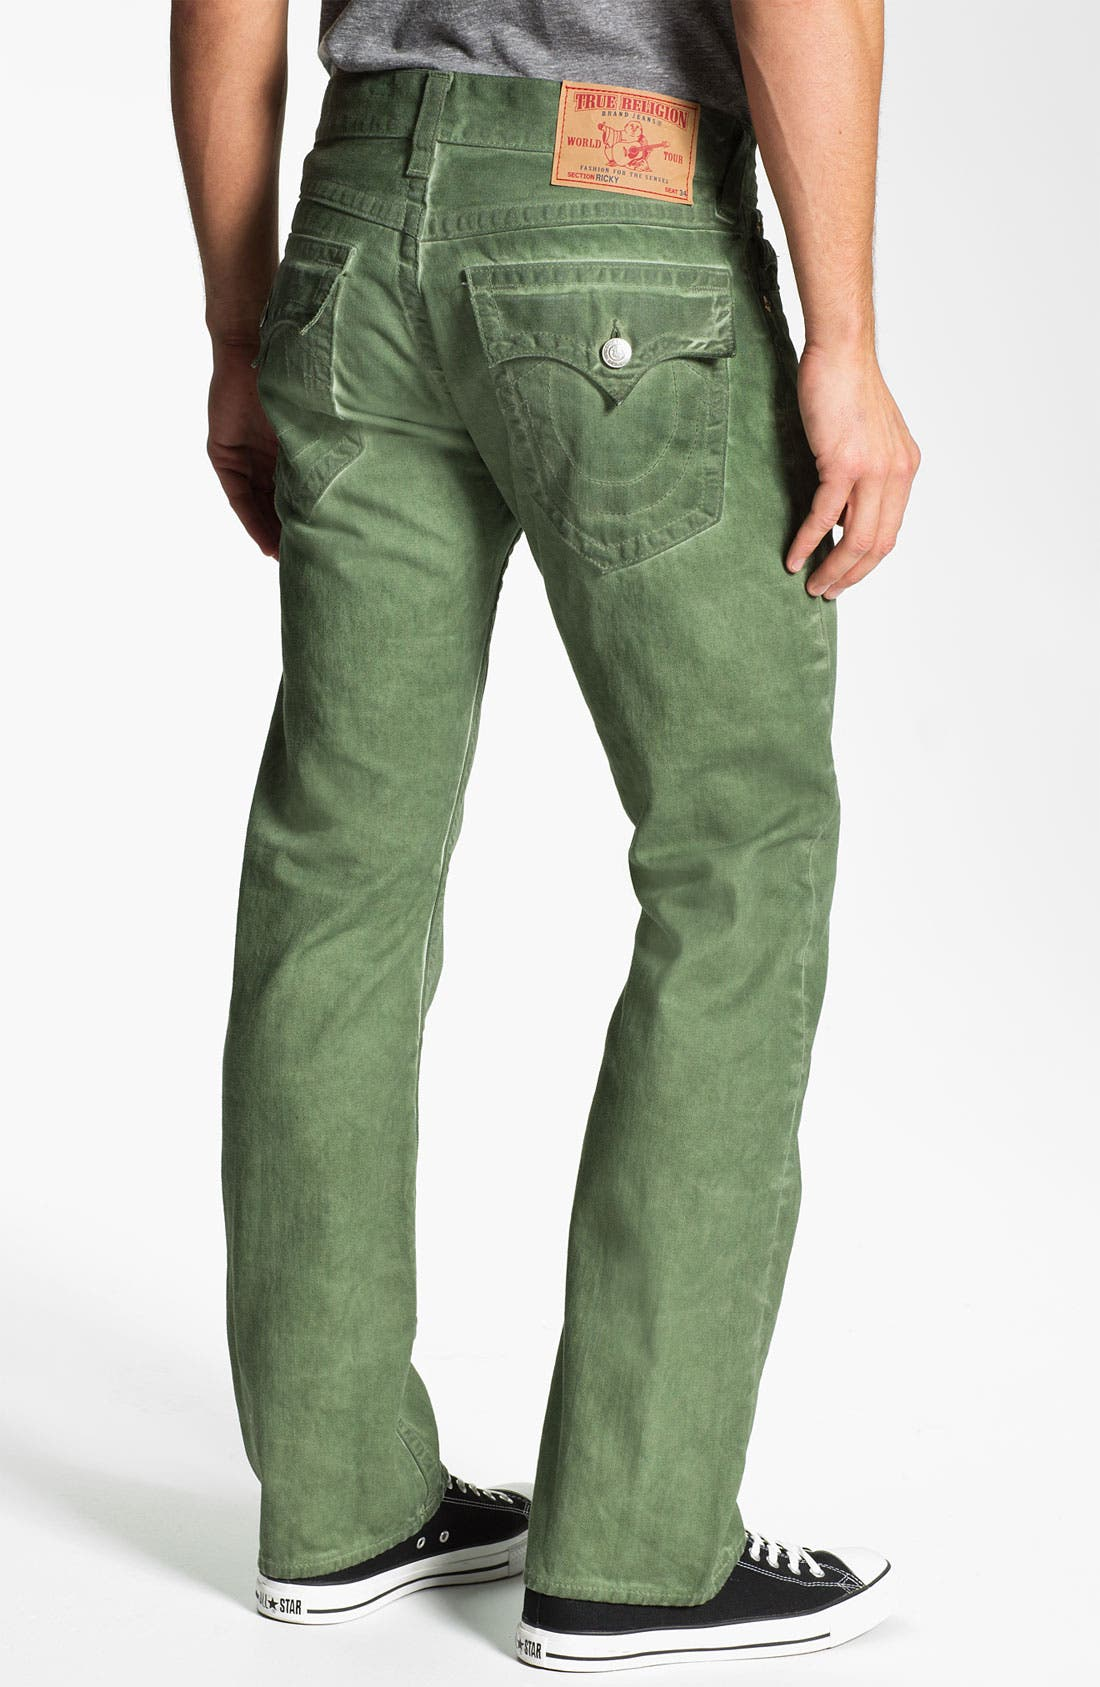 Alternate Image 1 Selected - True Religion Brand Jeans 'Ricky' Straight Leg Jeans (Mustard Yellow)